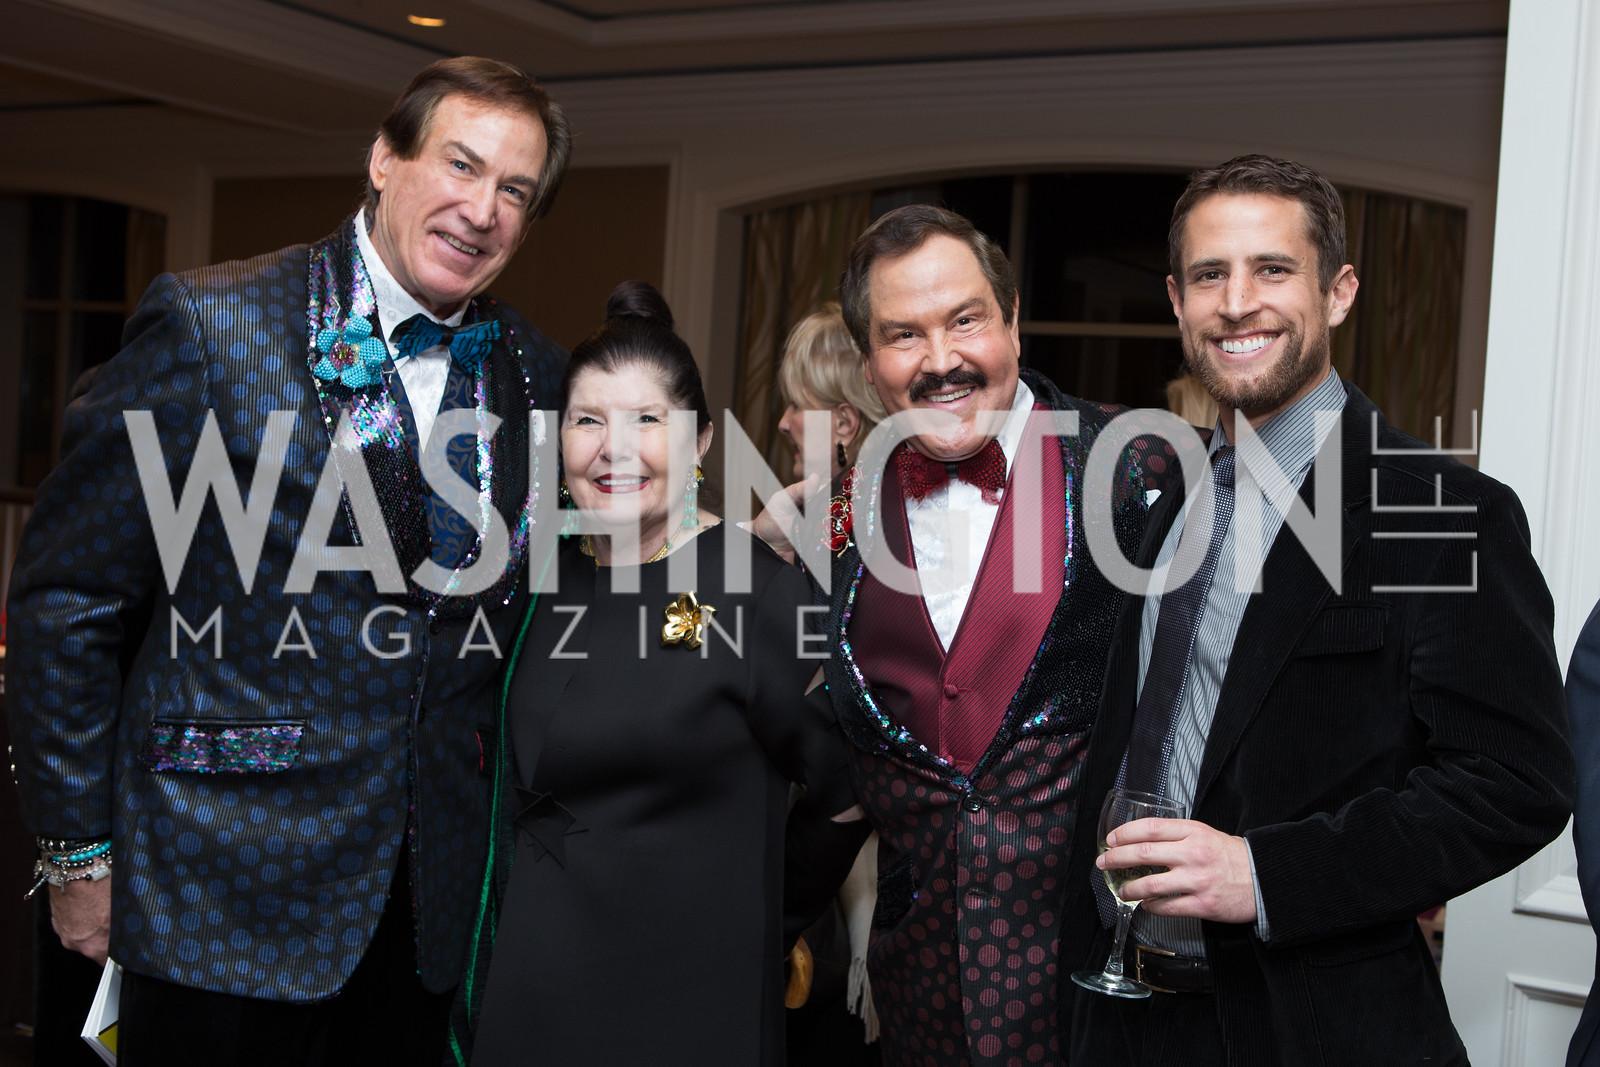 Tom Noll, Judith Terra, Alberto Ucles, James Hawthorn - Fearless Women Awards Ritz Carlton Tysons Corner January 21, 2018 Photo by Naku Mayo